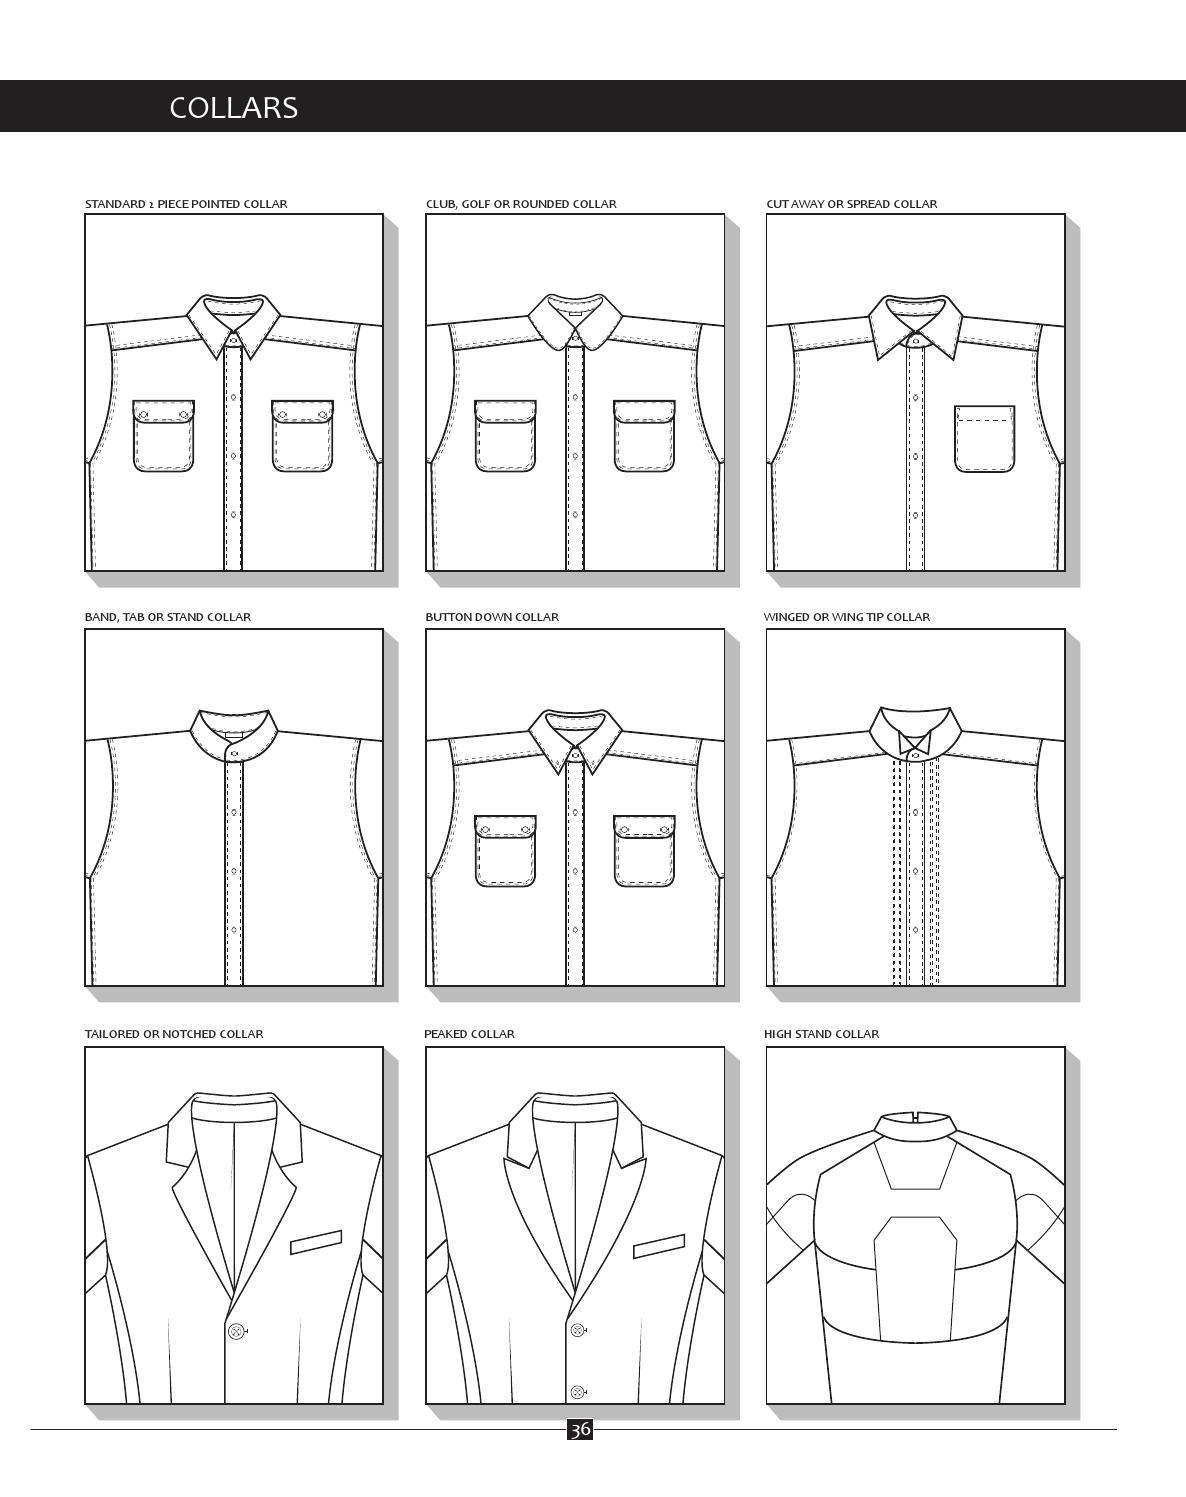 Fashion flats   Menswear by Merrin Stacey   issuu